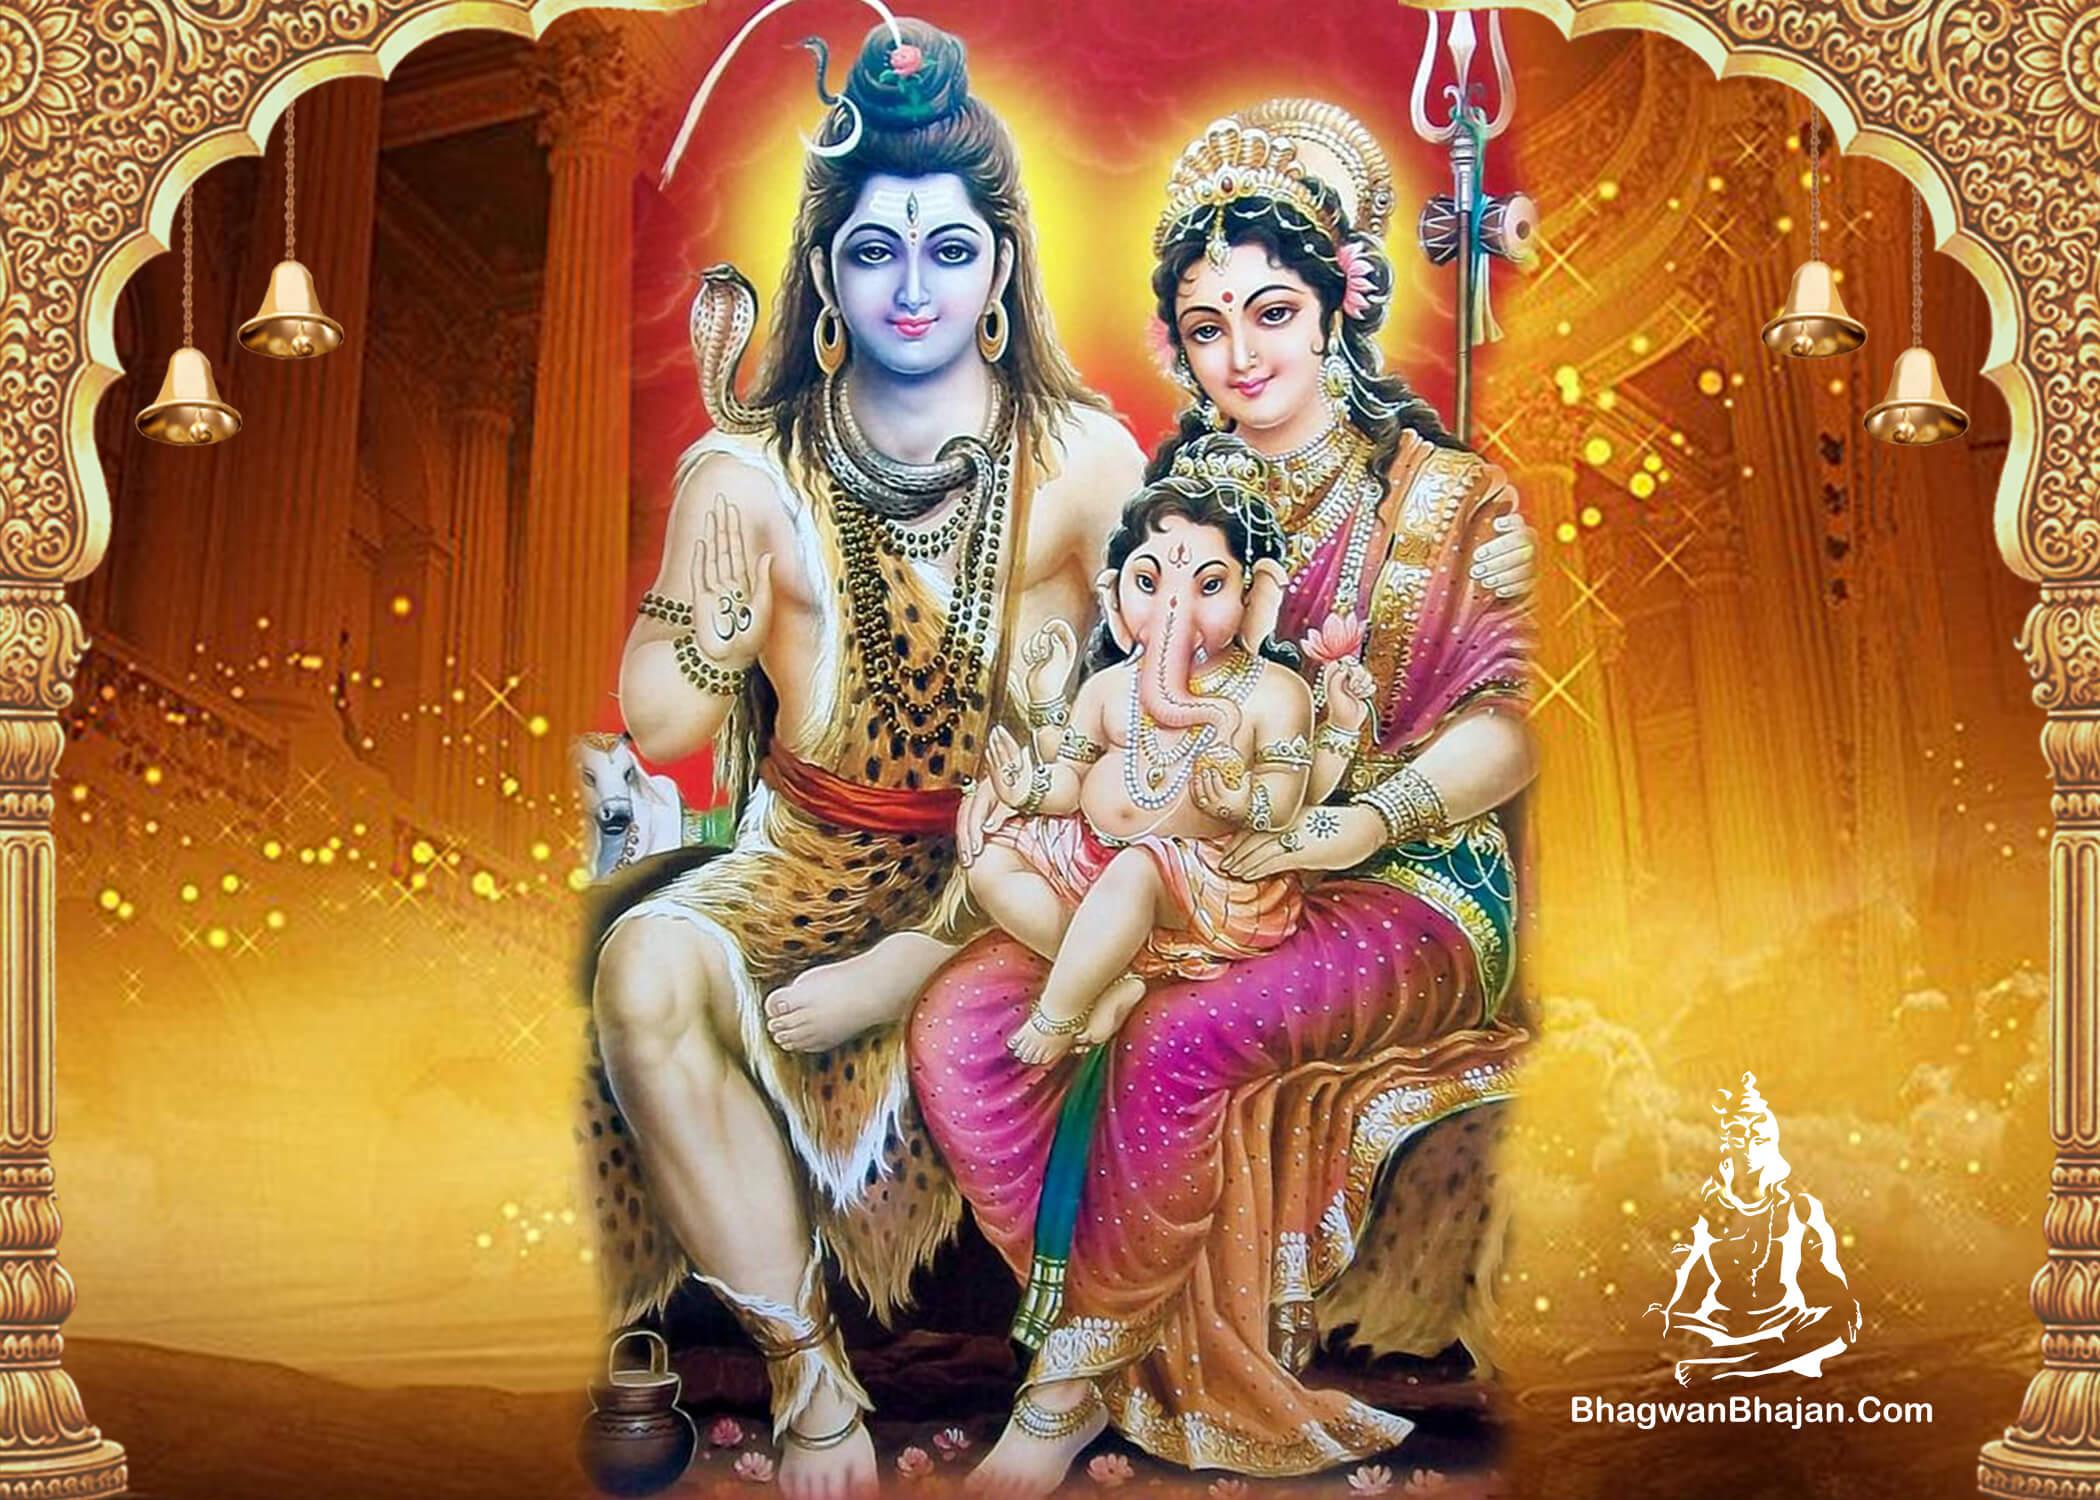 bhagwan shiv maa parvati bal ganesha wallpaper